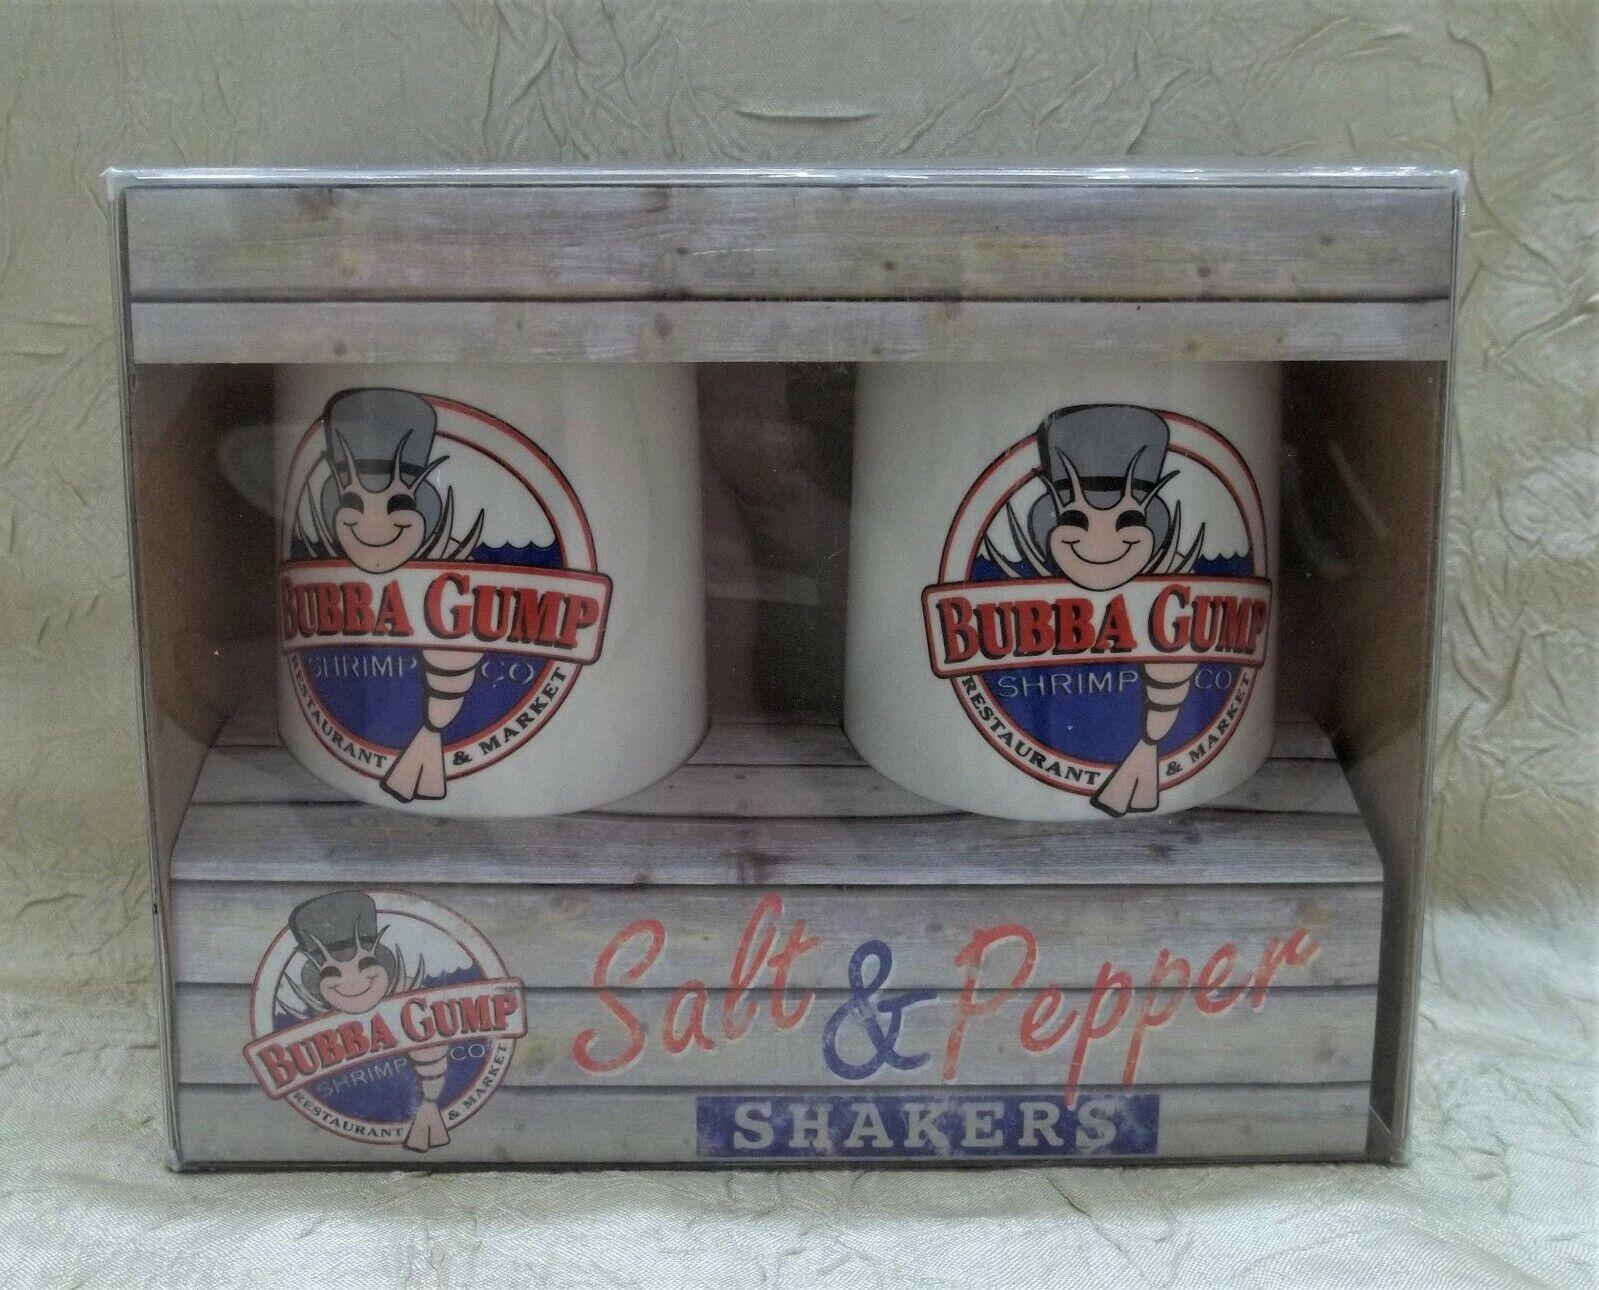 Bubba Gump Shrimp Company Restaurant Salt & Pepper Shaker Set New In Box